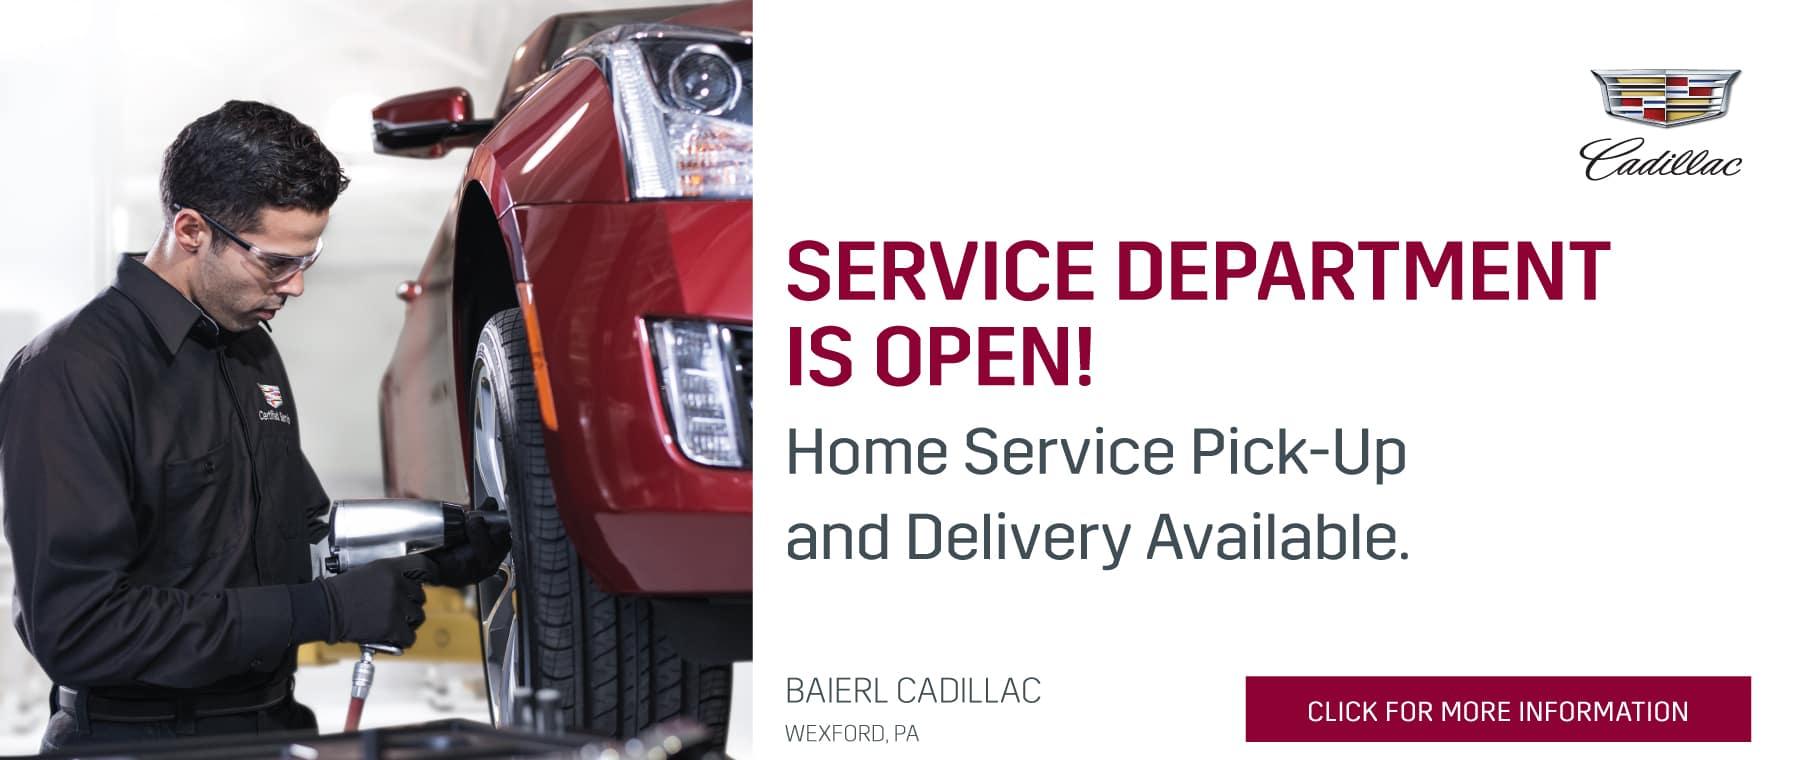 Service Department Open HS